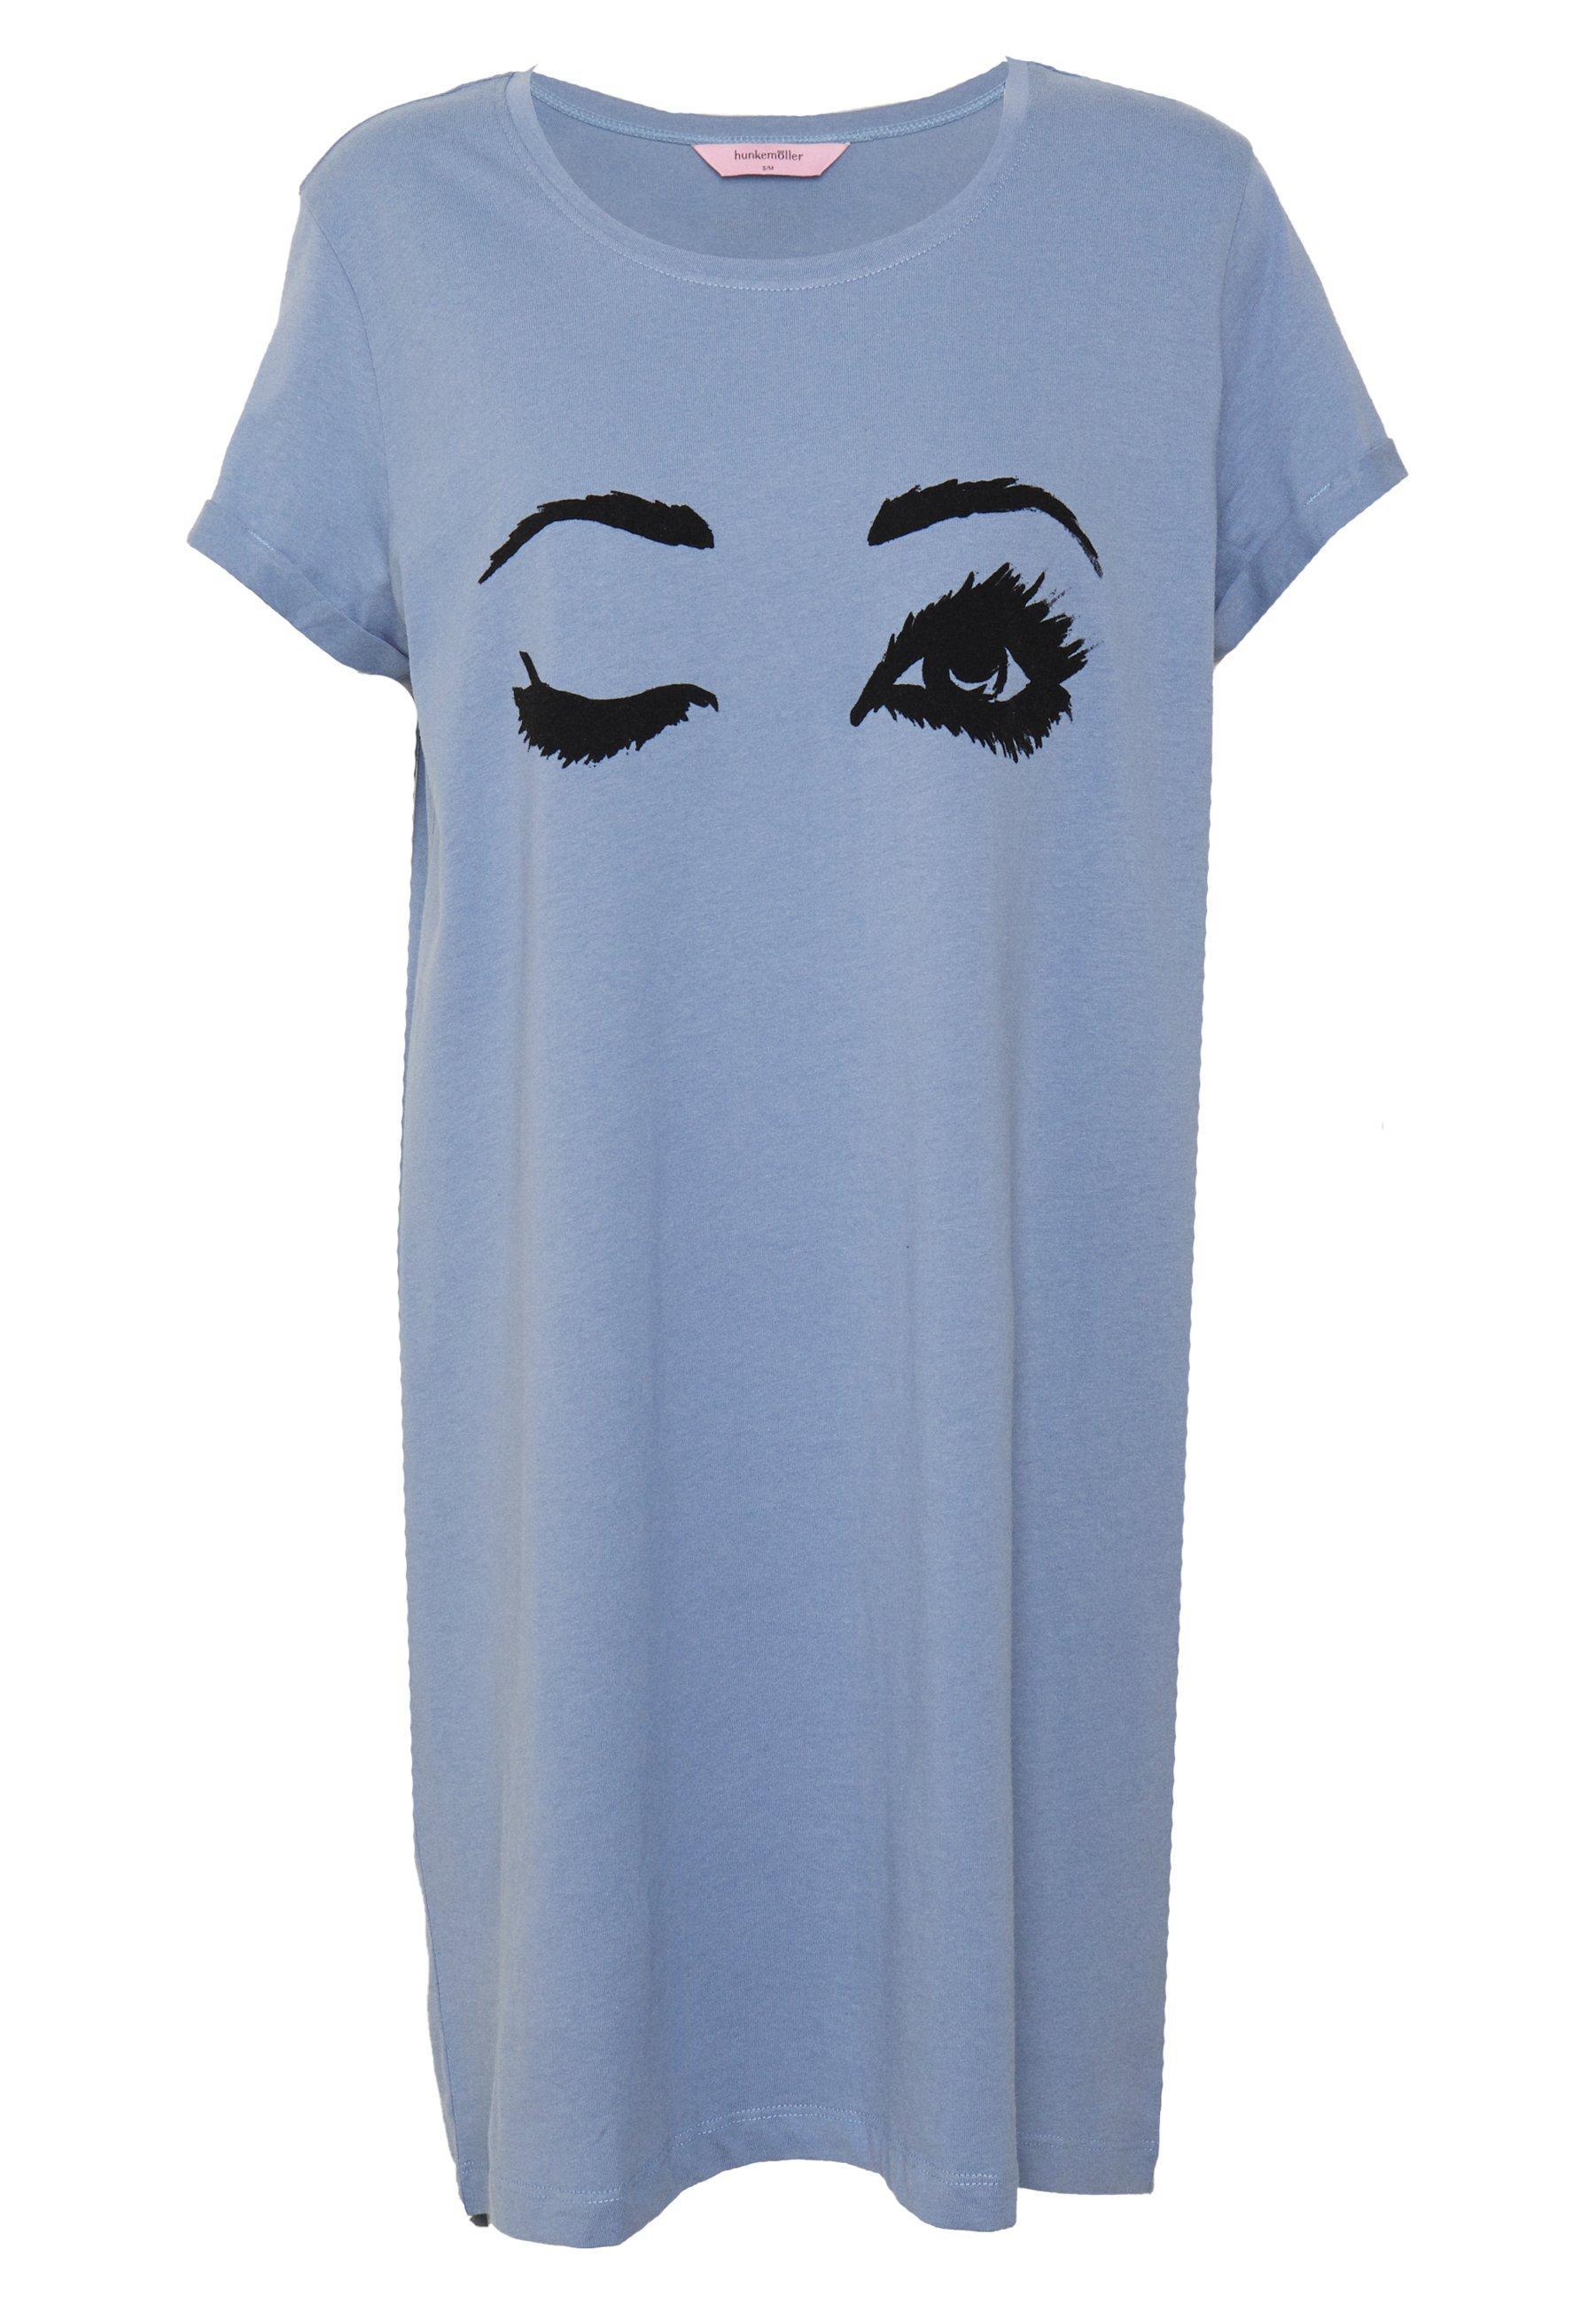 Hunkemöller Nightie R Neck - Nattskjorte Country Blue/blå